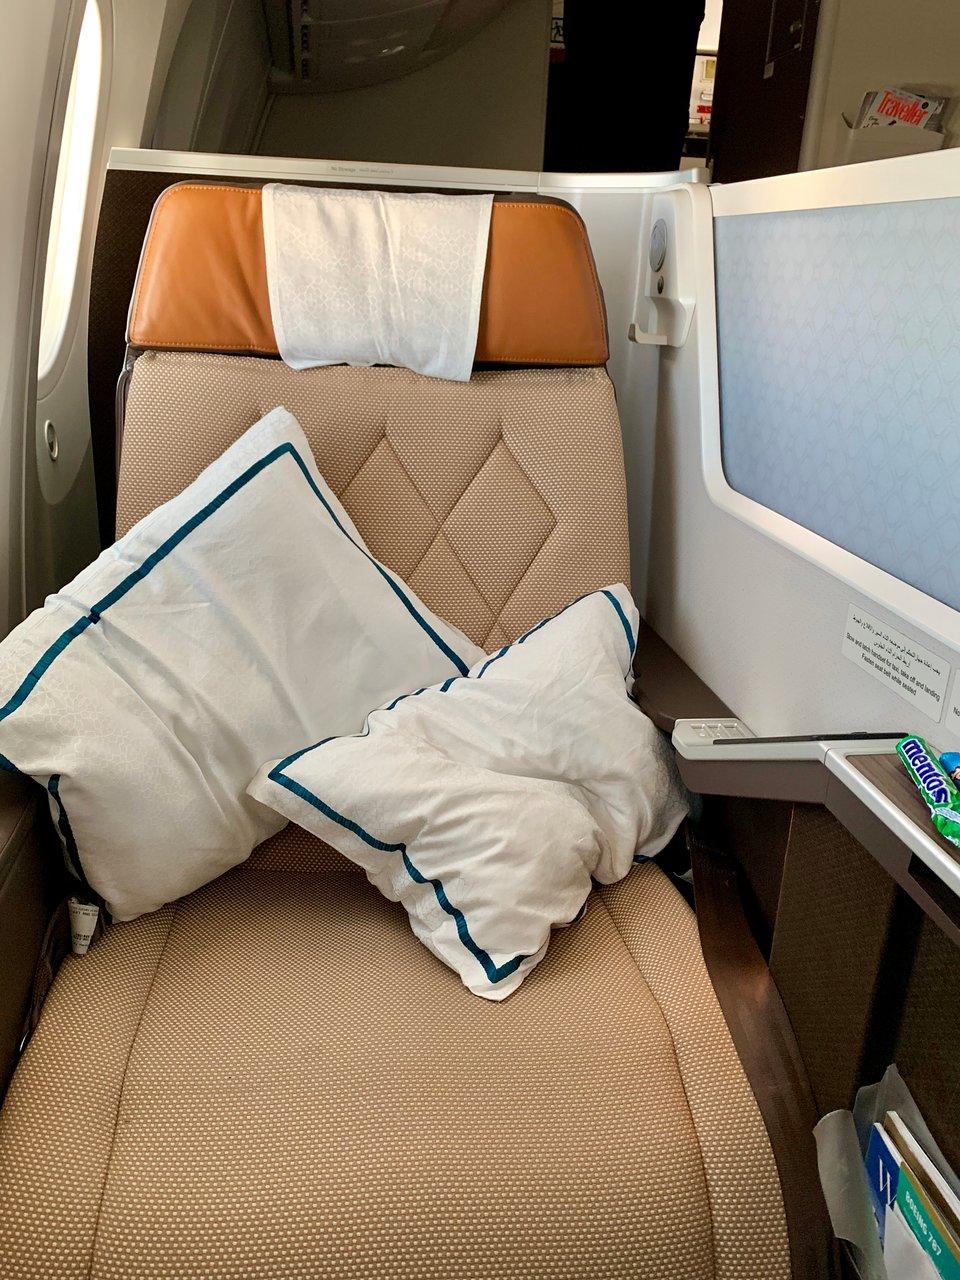 Oman Air Flights and Reviews (with photos) - TripAdvisor